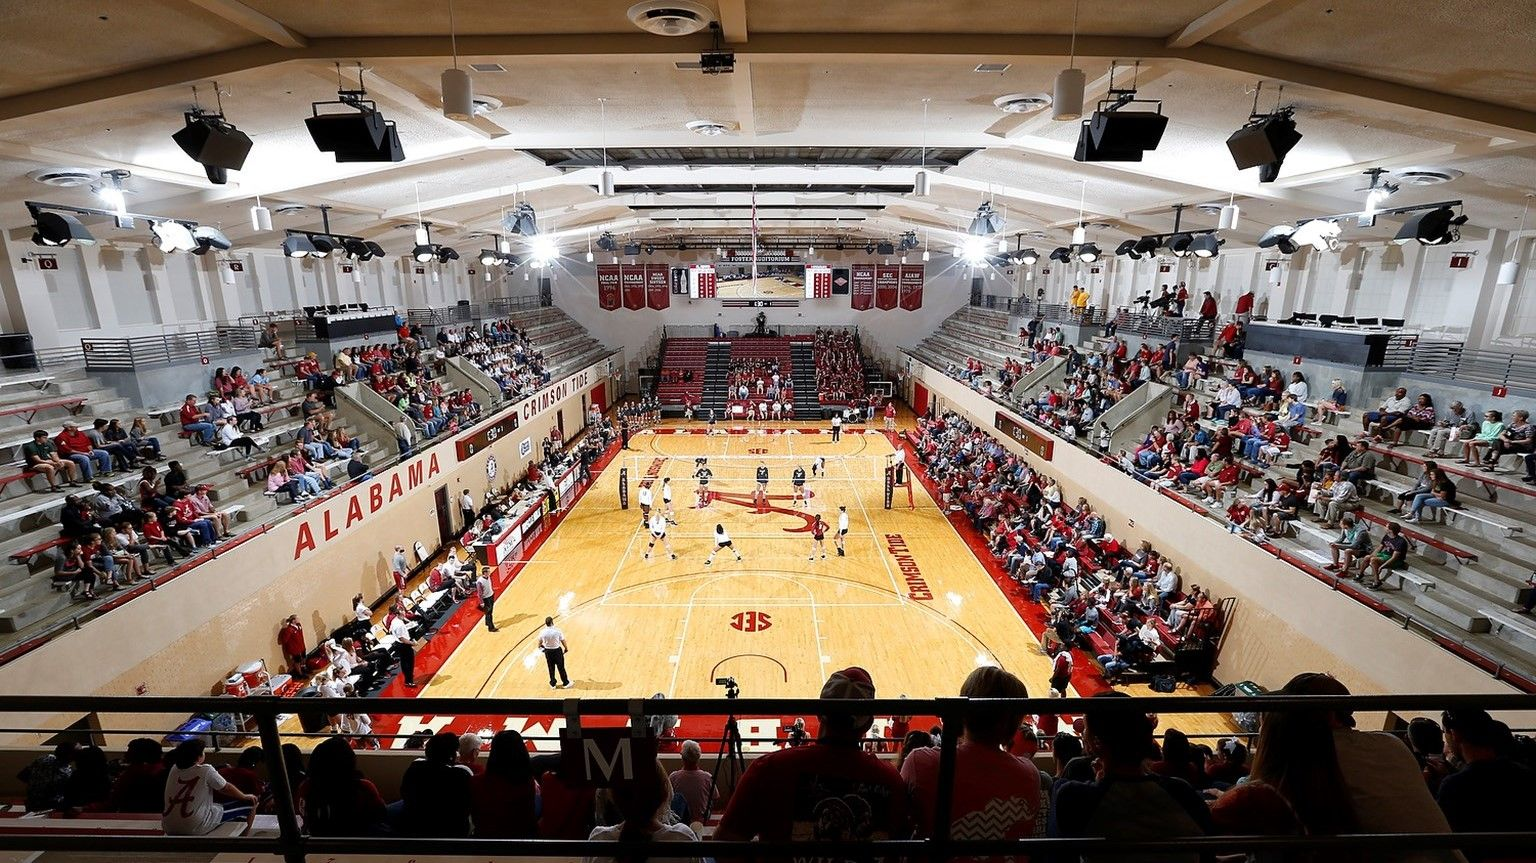 Alabama Volleyball Finalizes 2016 Schedule University Of Alabama Athletics Alabama Athletics Volleyball Alabama